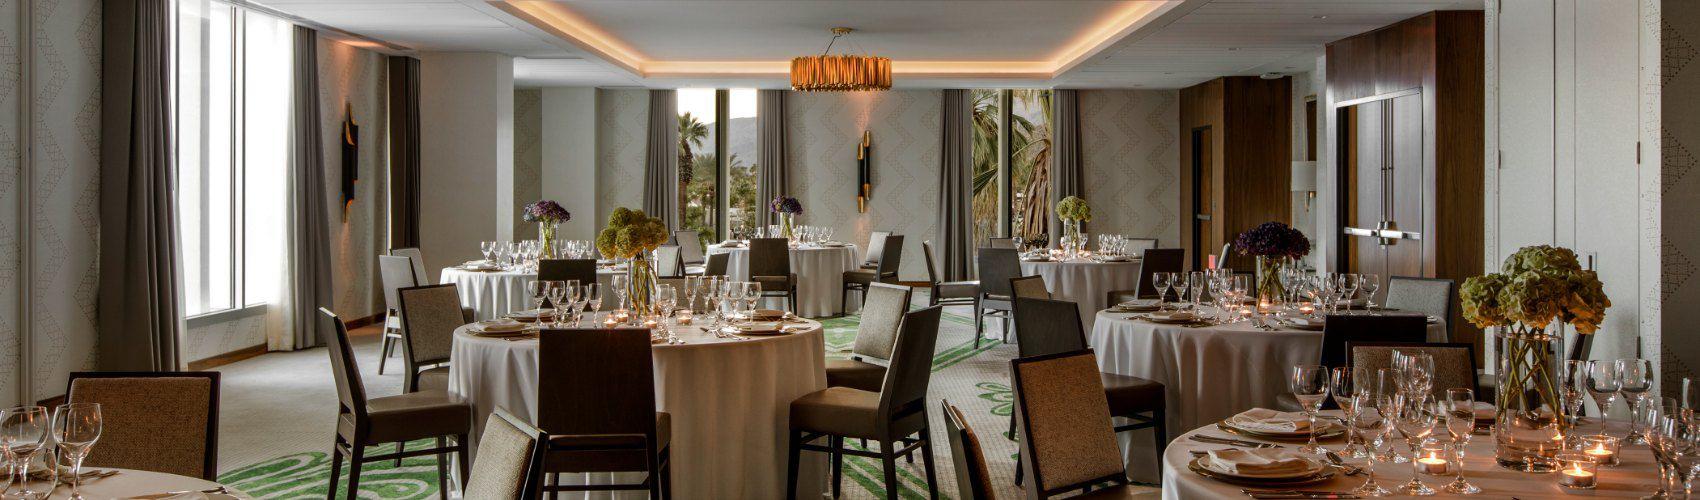 Palm springs ca wedding venues kimpton weddings weddings at kimpton hotels in palm springs junglespirit Gallery